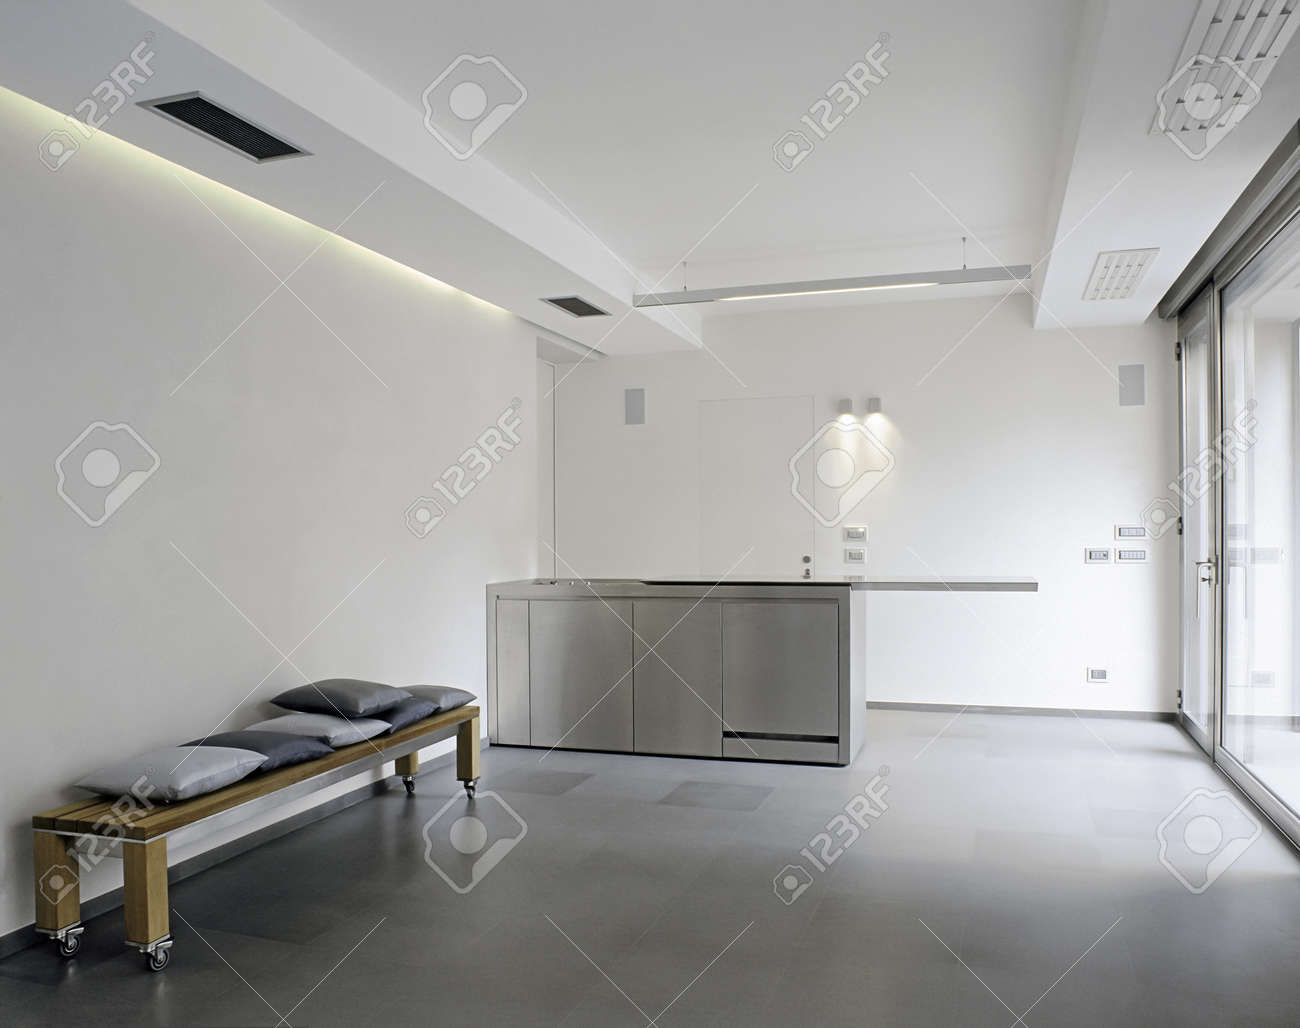 Piastrelle grigie per cucina moderna : piastrelle bagno color oro ...